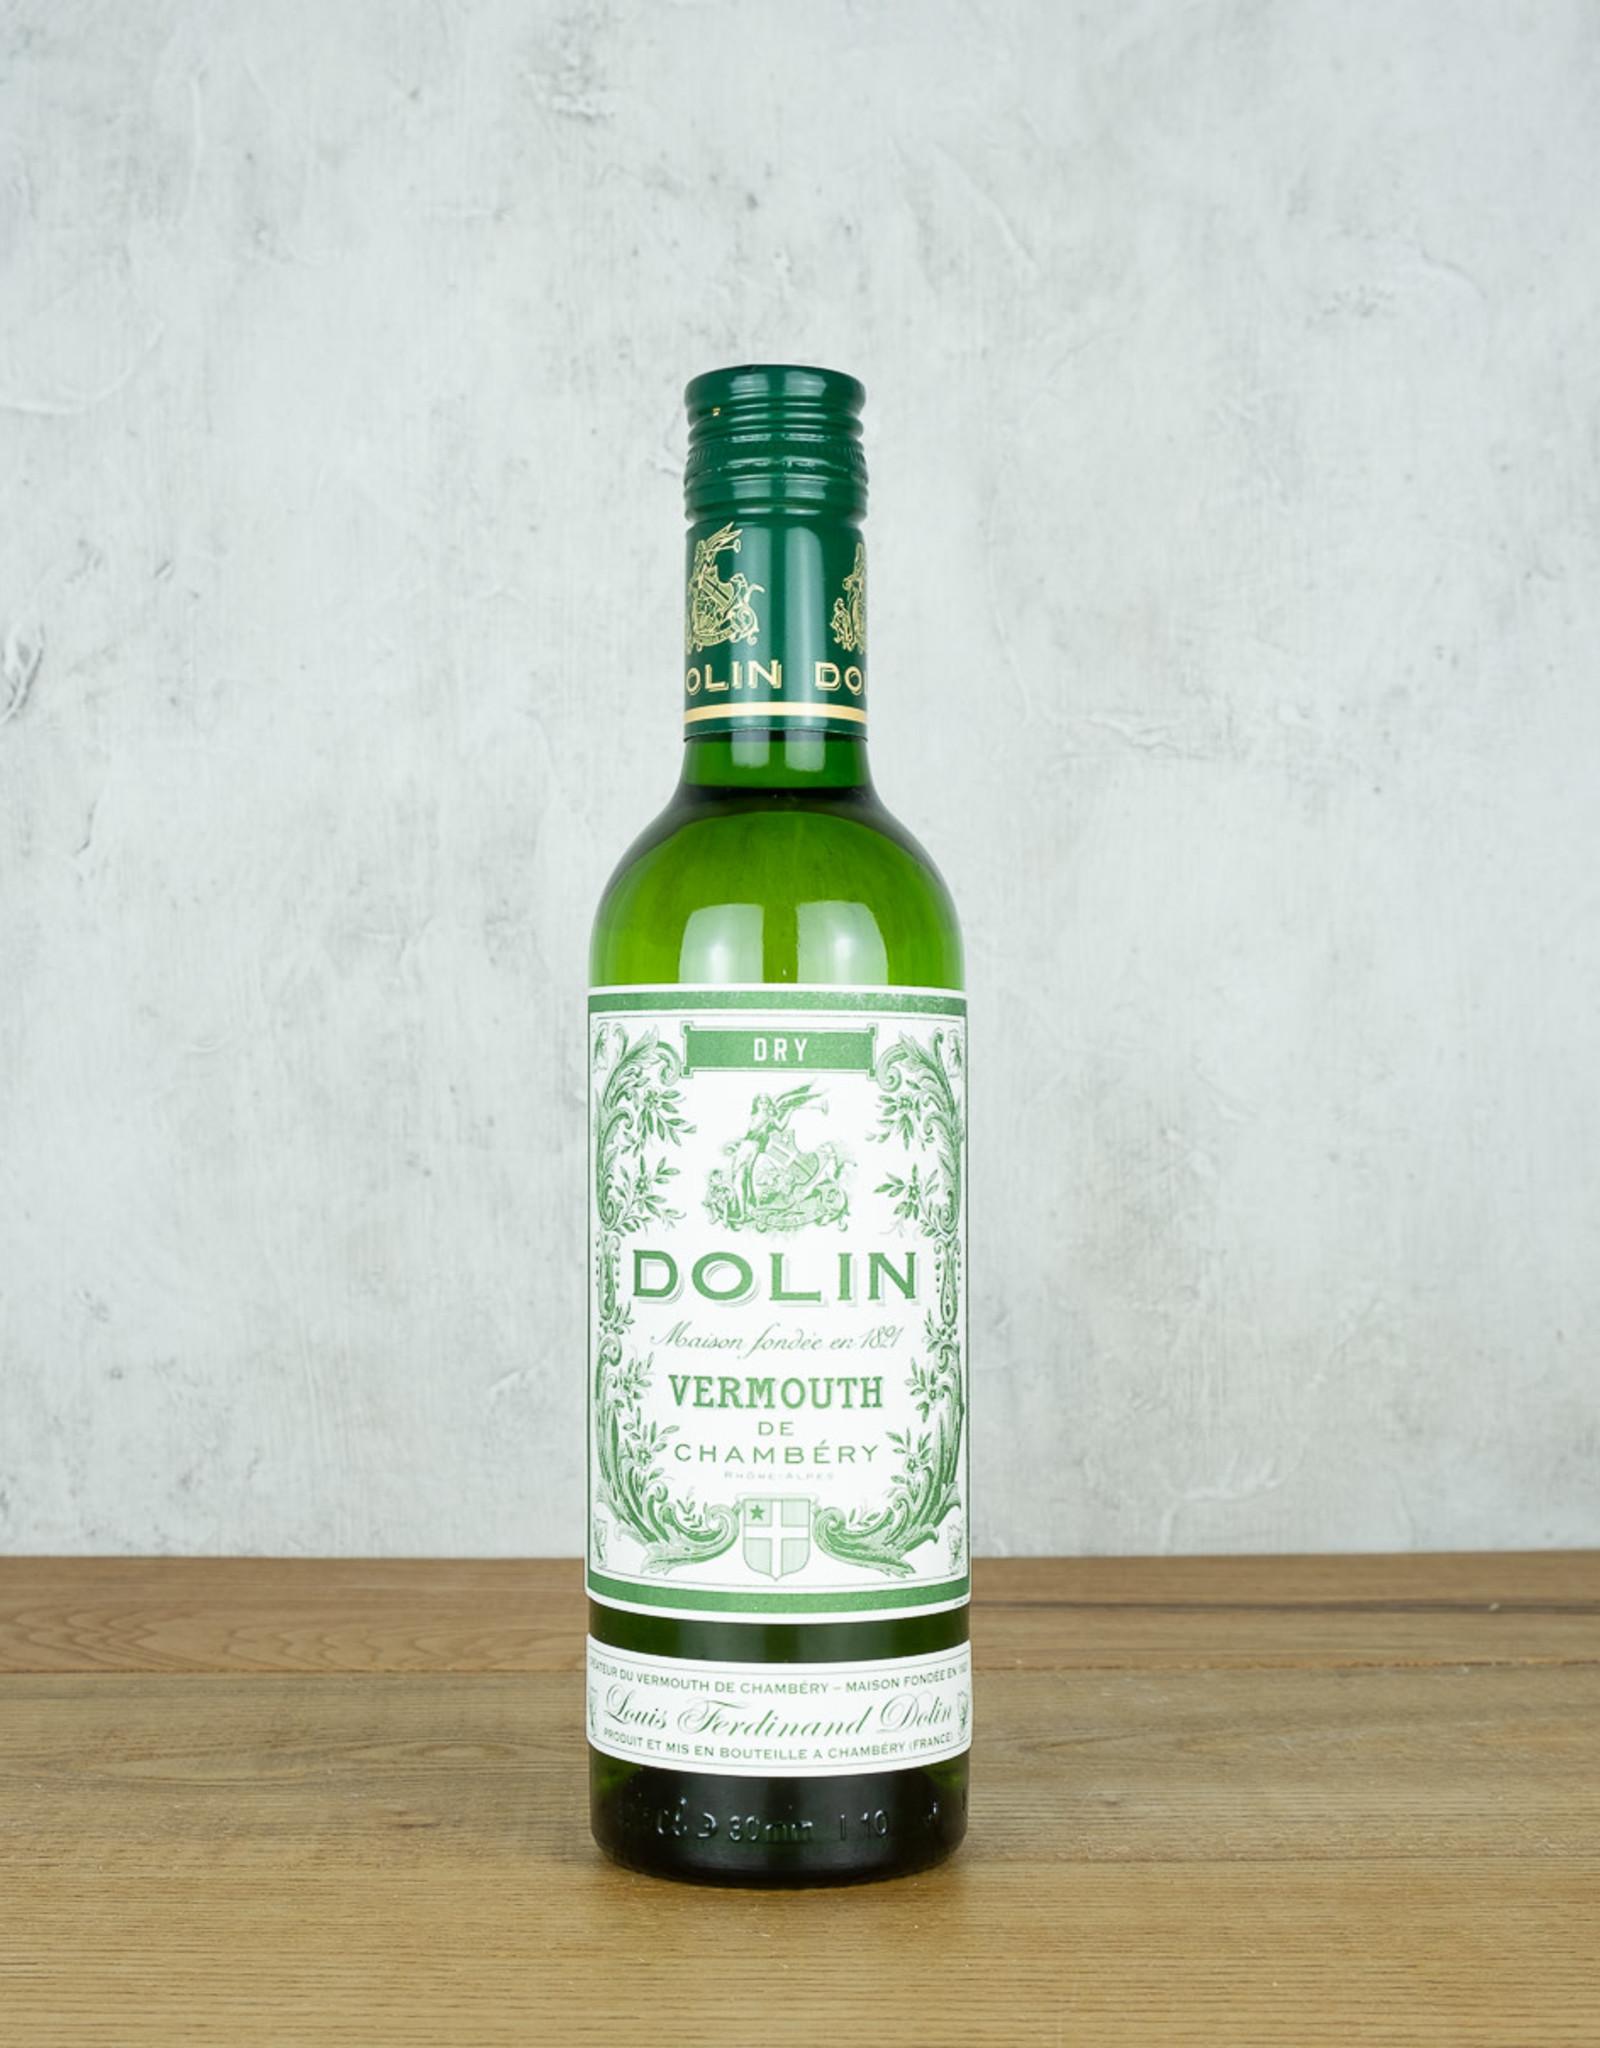 Dolin Dry Vermouth 375ml